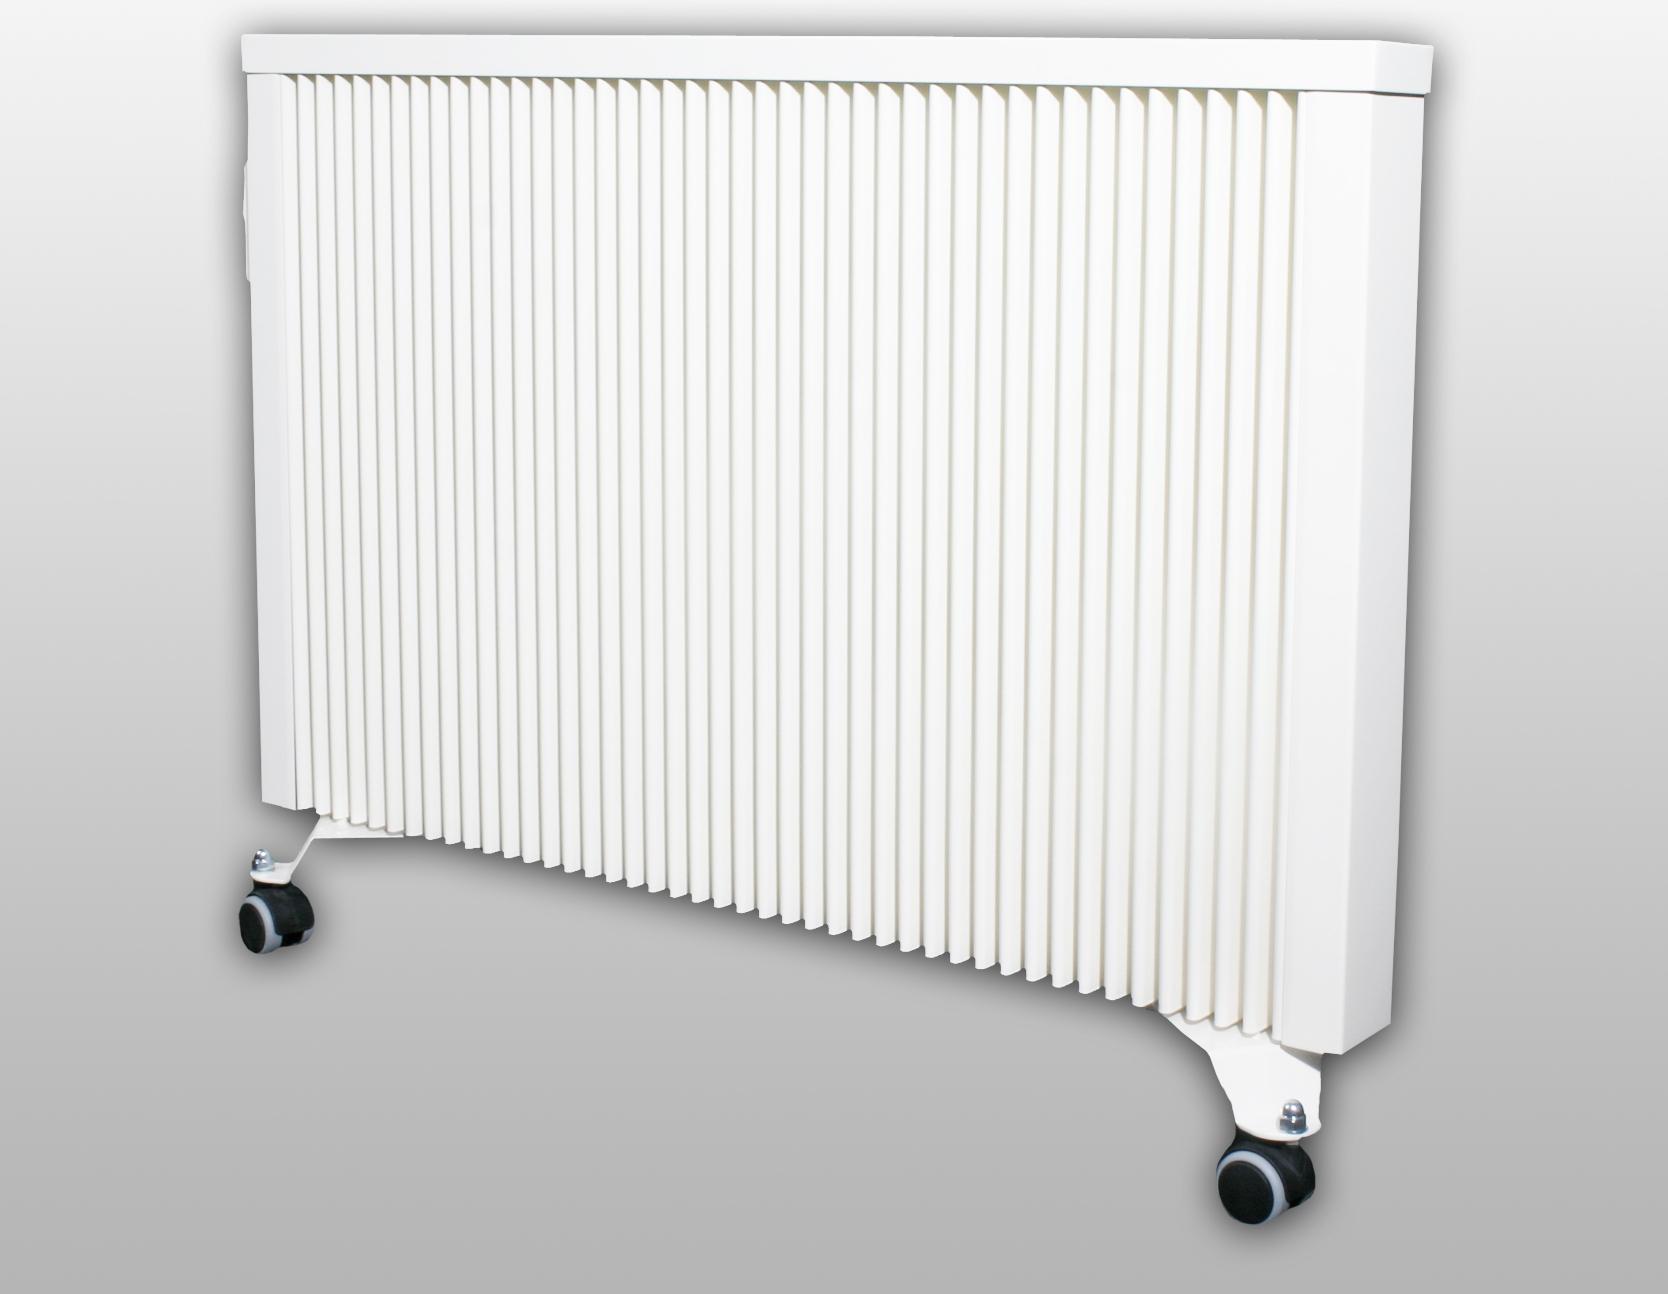 Topný panel série H, TYP H250, 2500 W